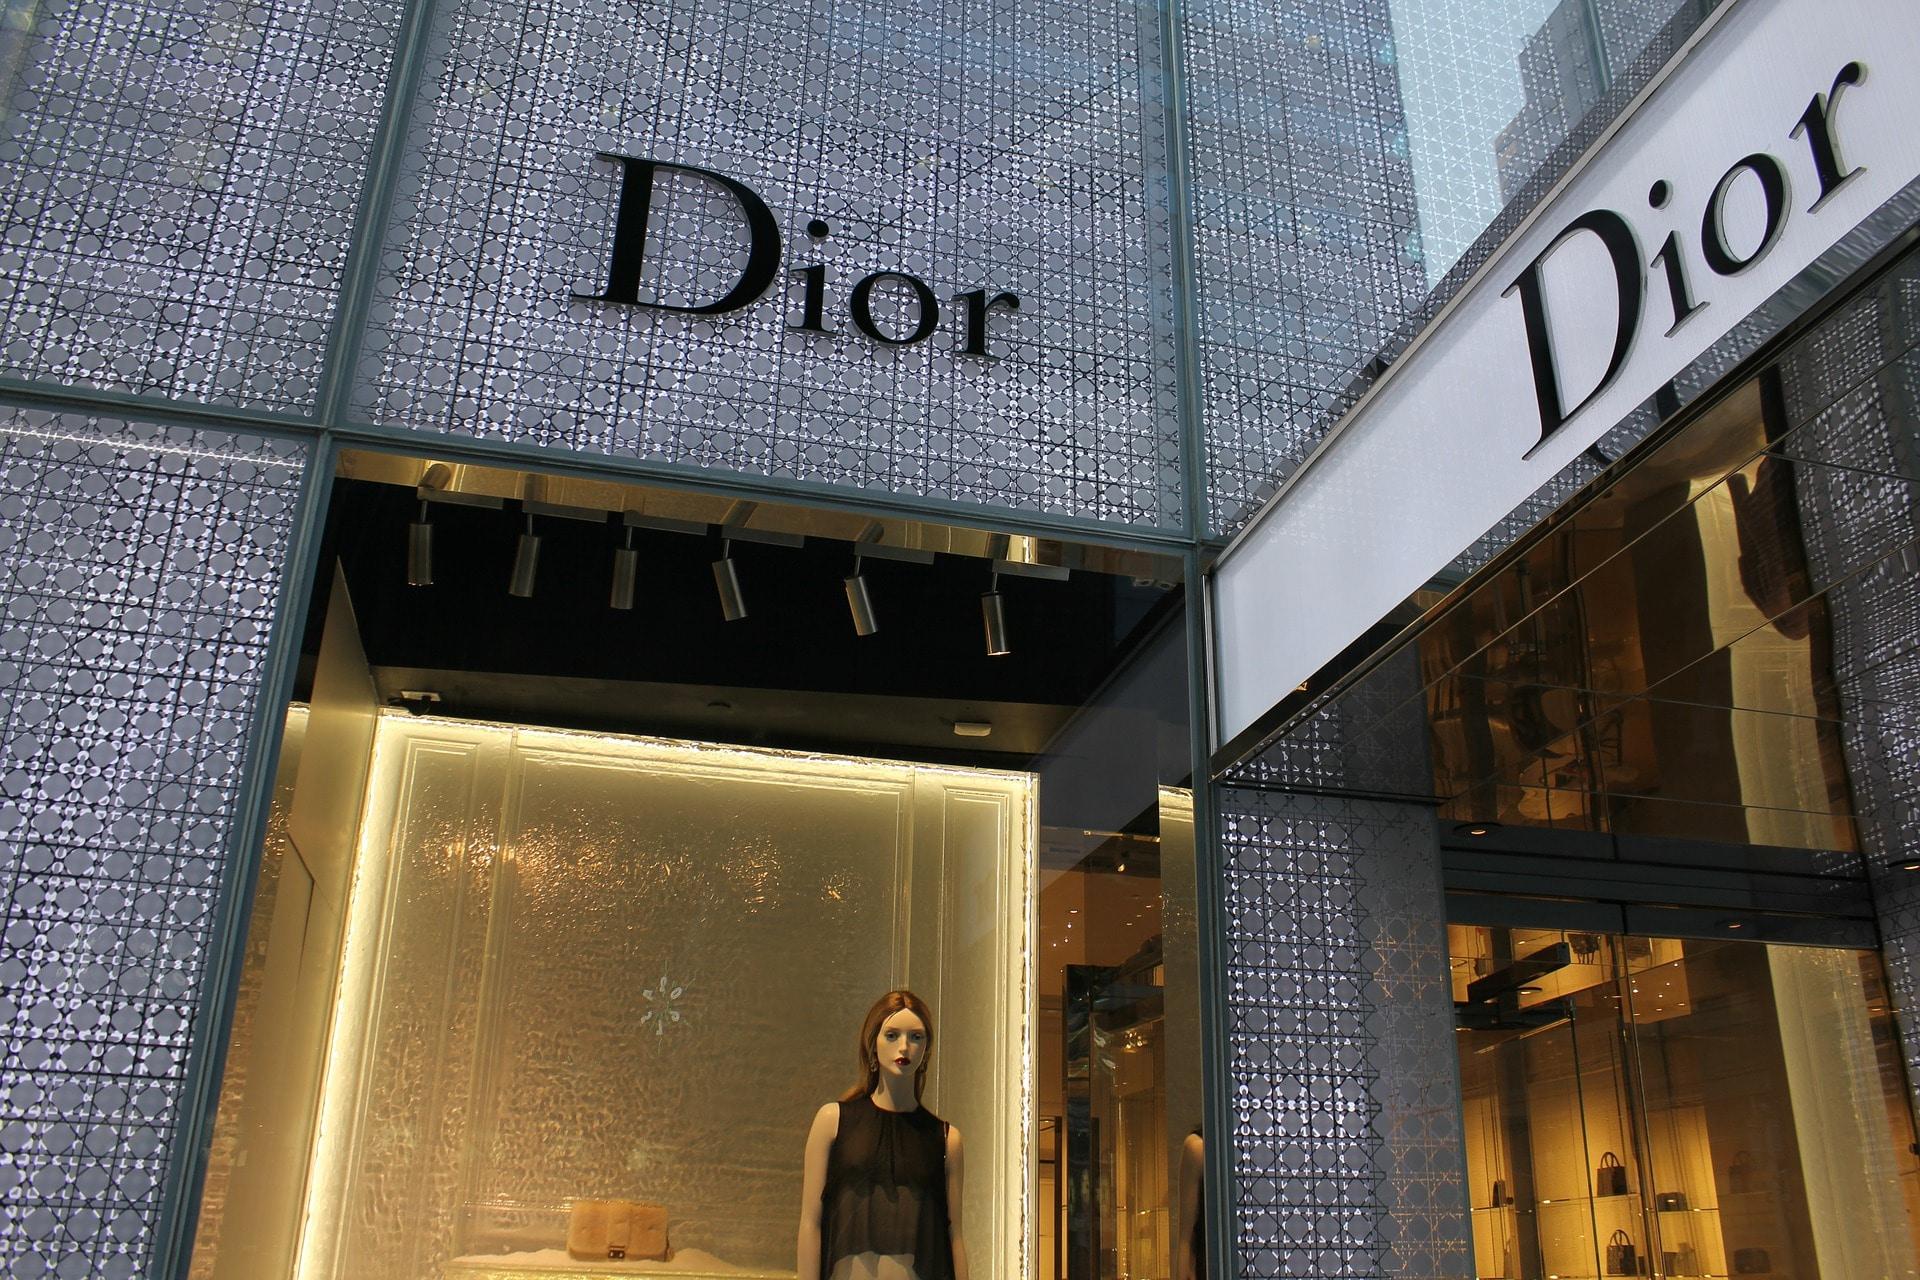 Lunette Christian Dior